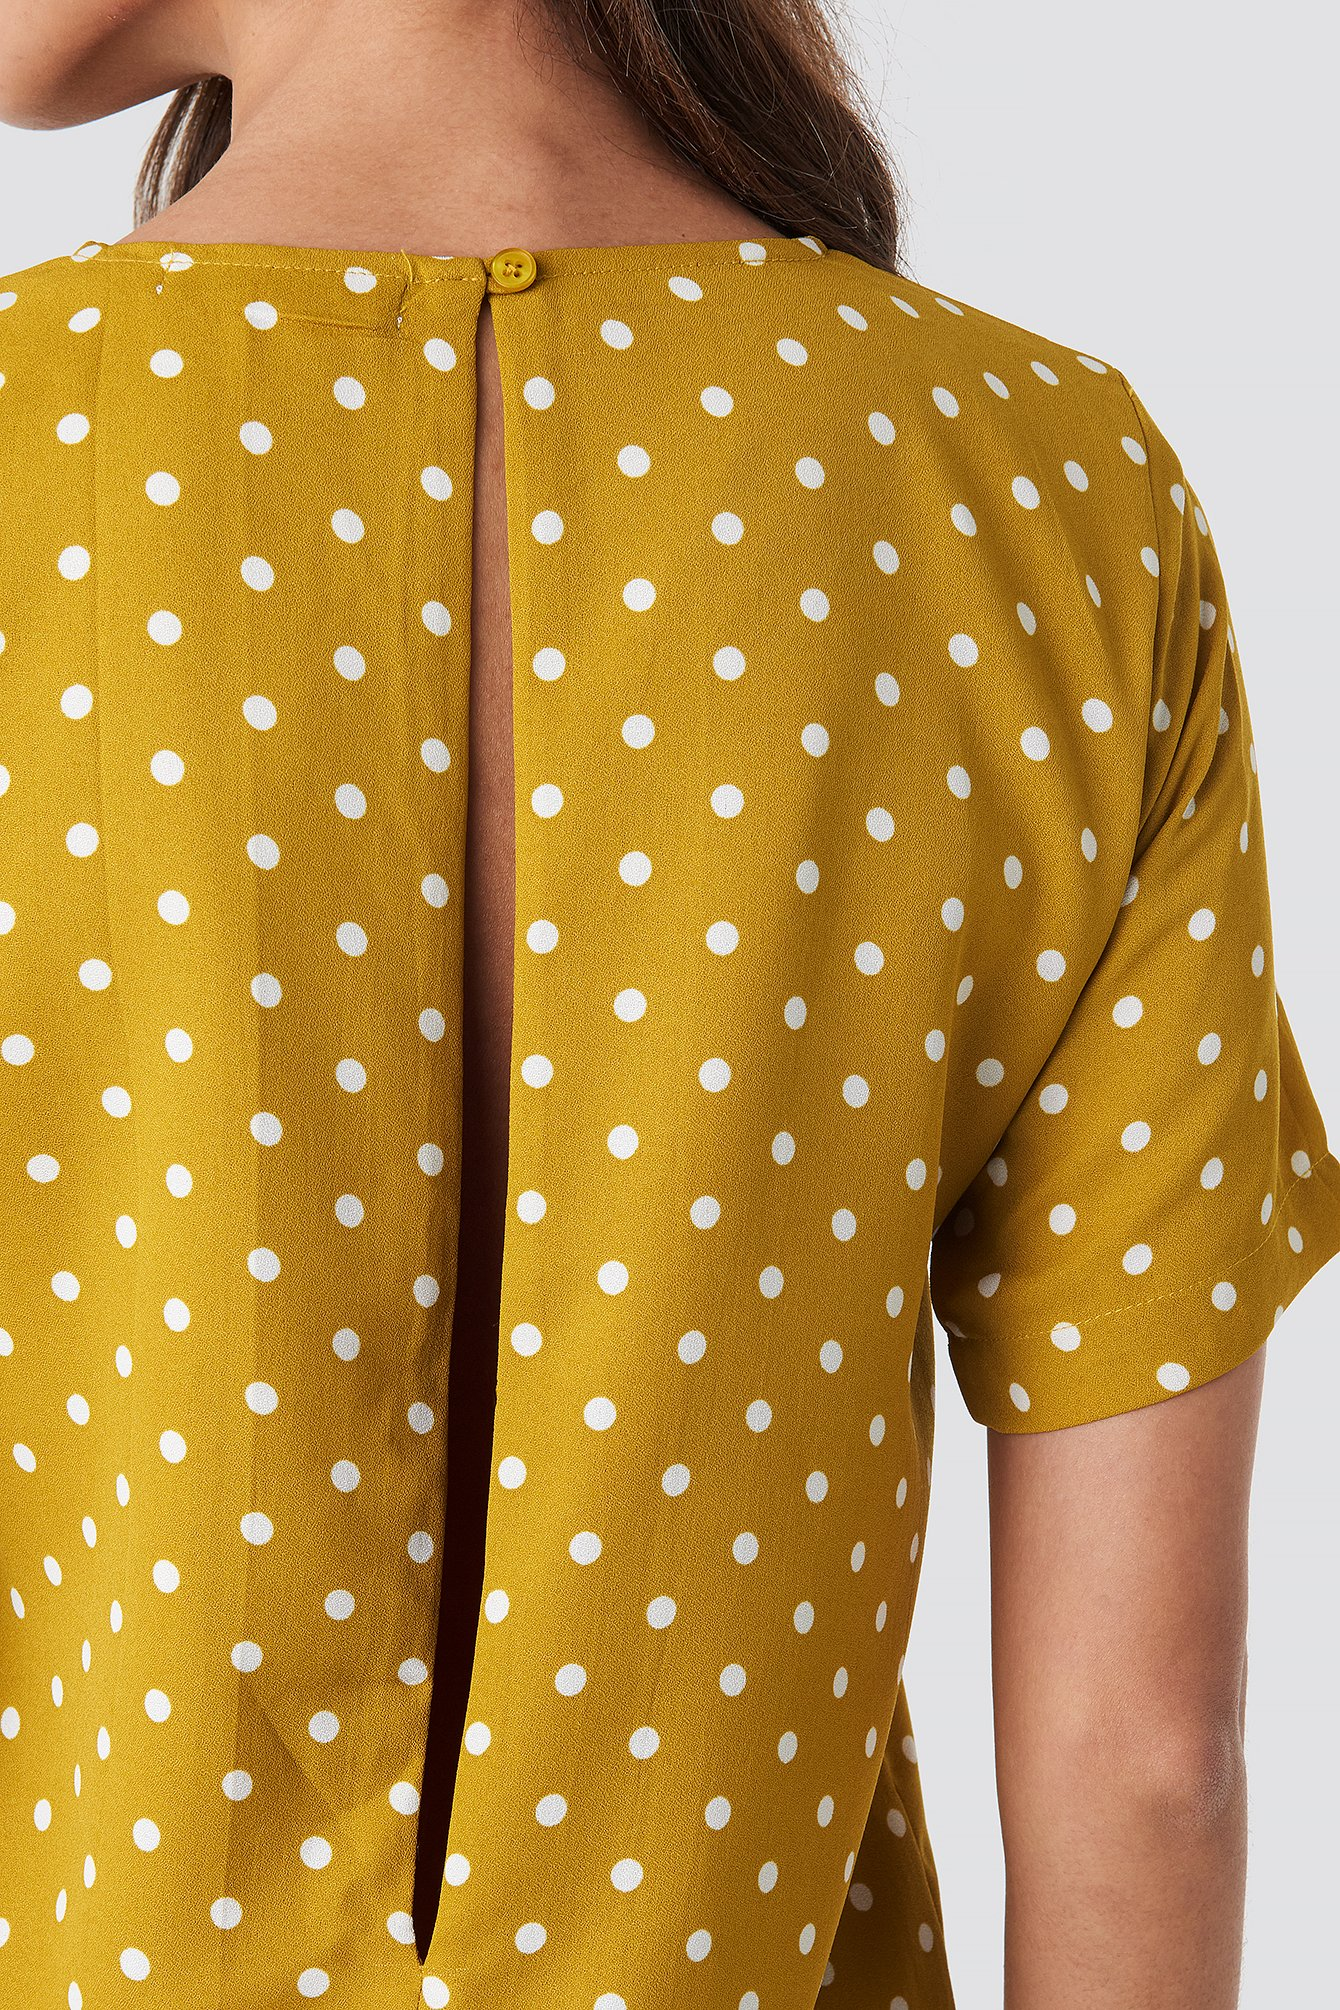 Round Dotted Mini Dress NA-KD.COM